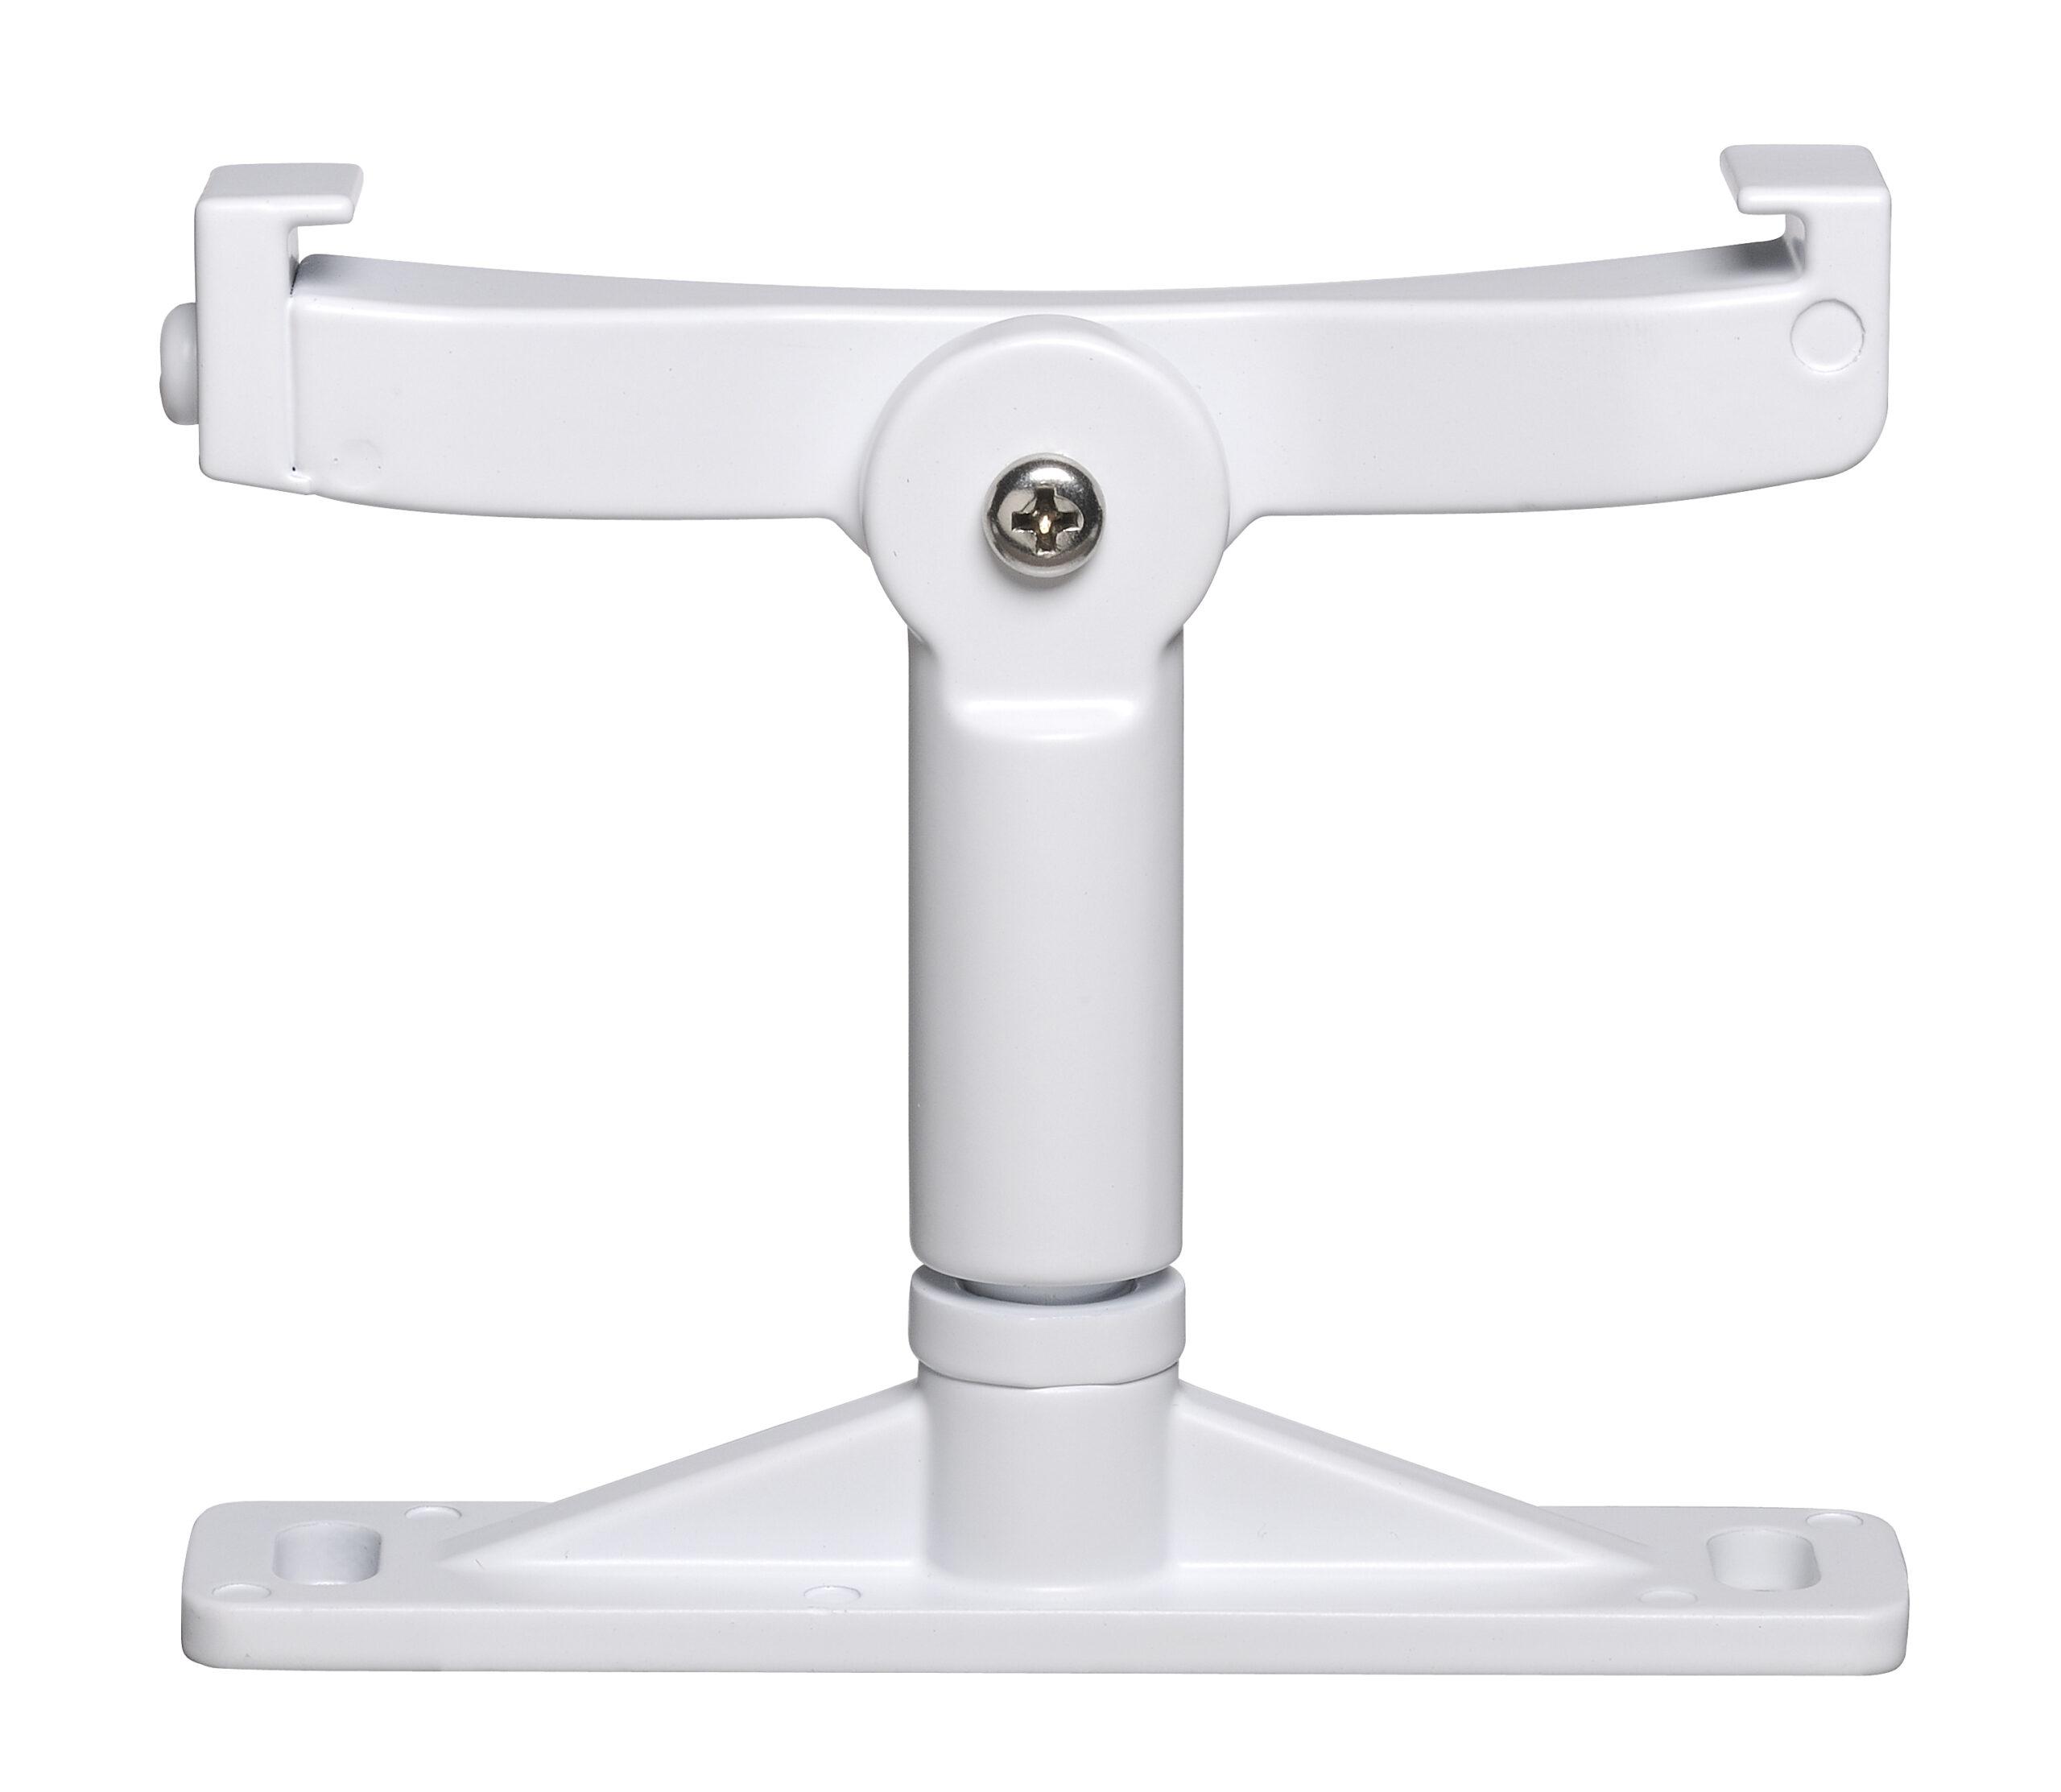 Fixation standard pour gamme TH (Design ou Elegance)